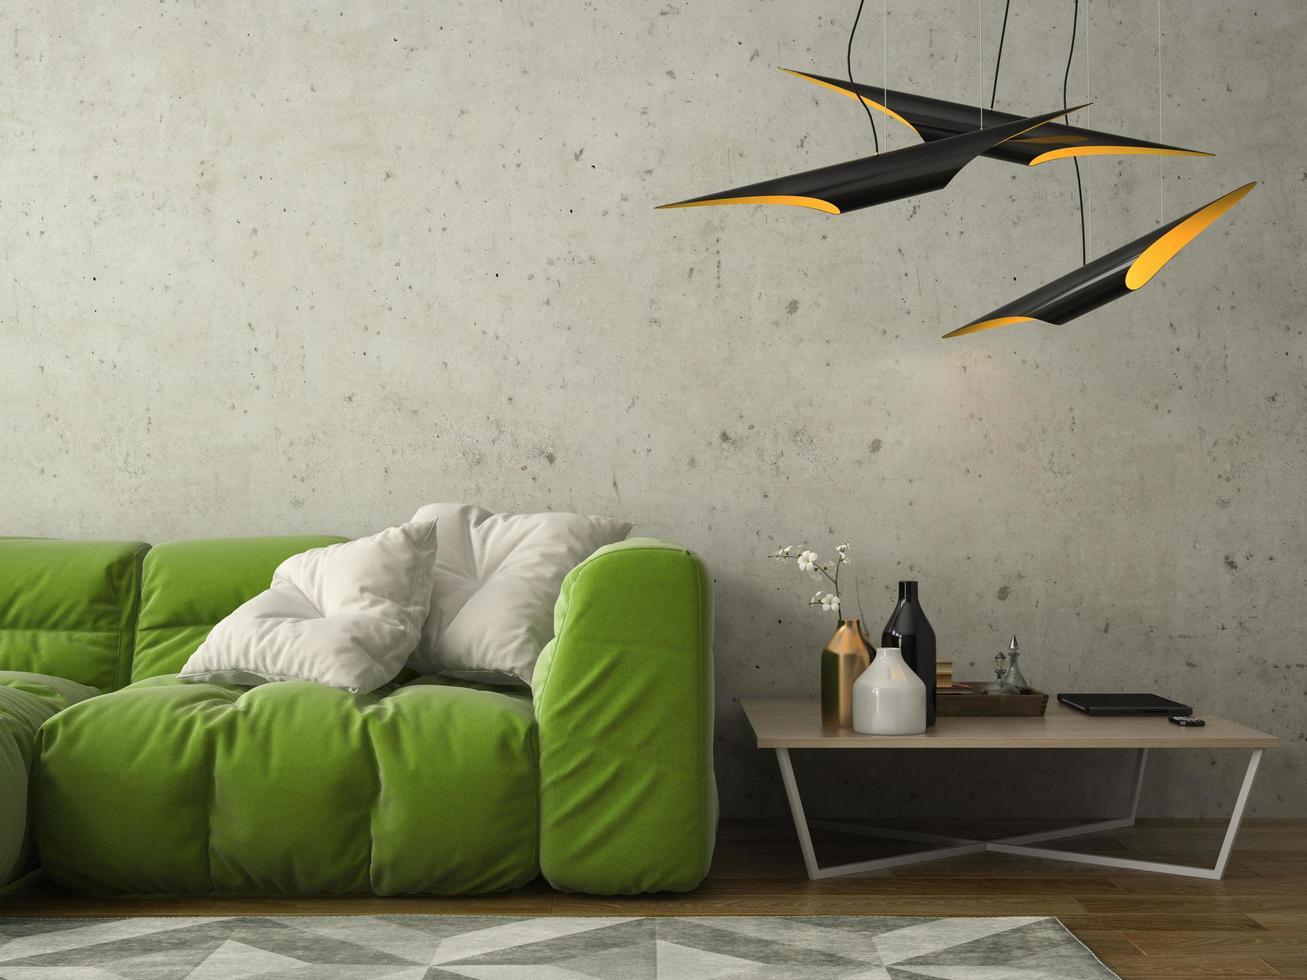 Interior design of a modern room in 3D illustration photo